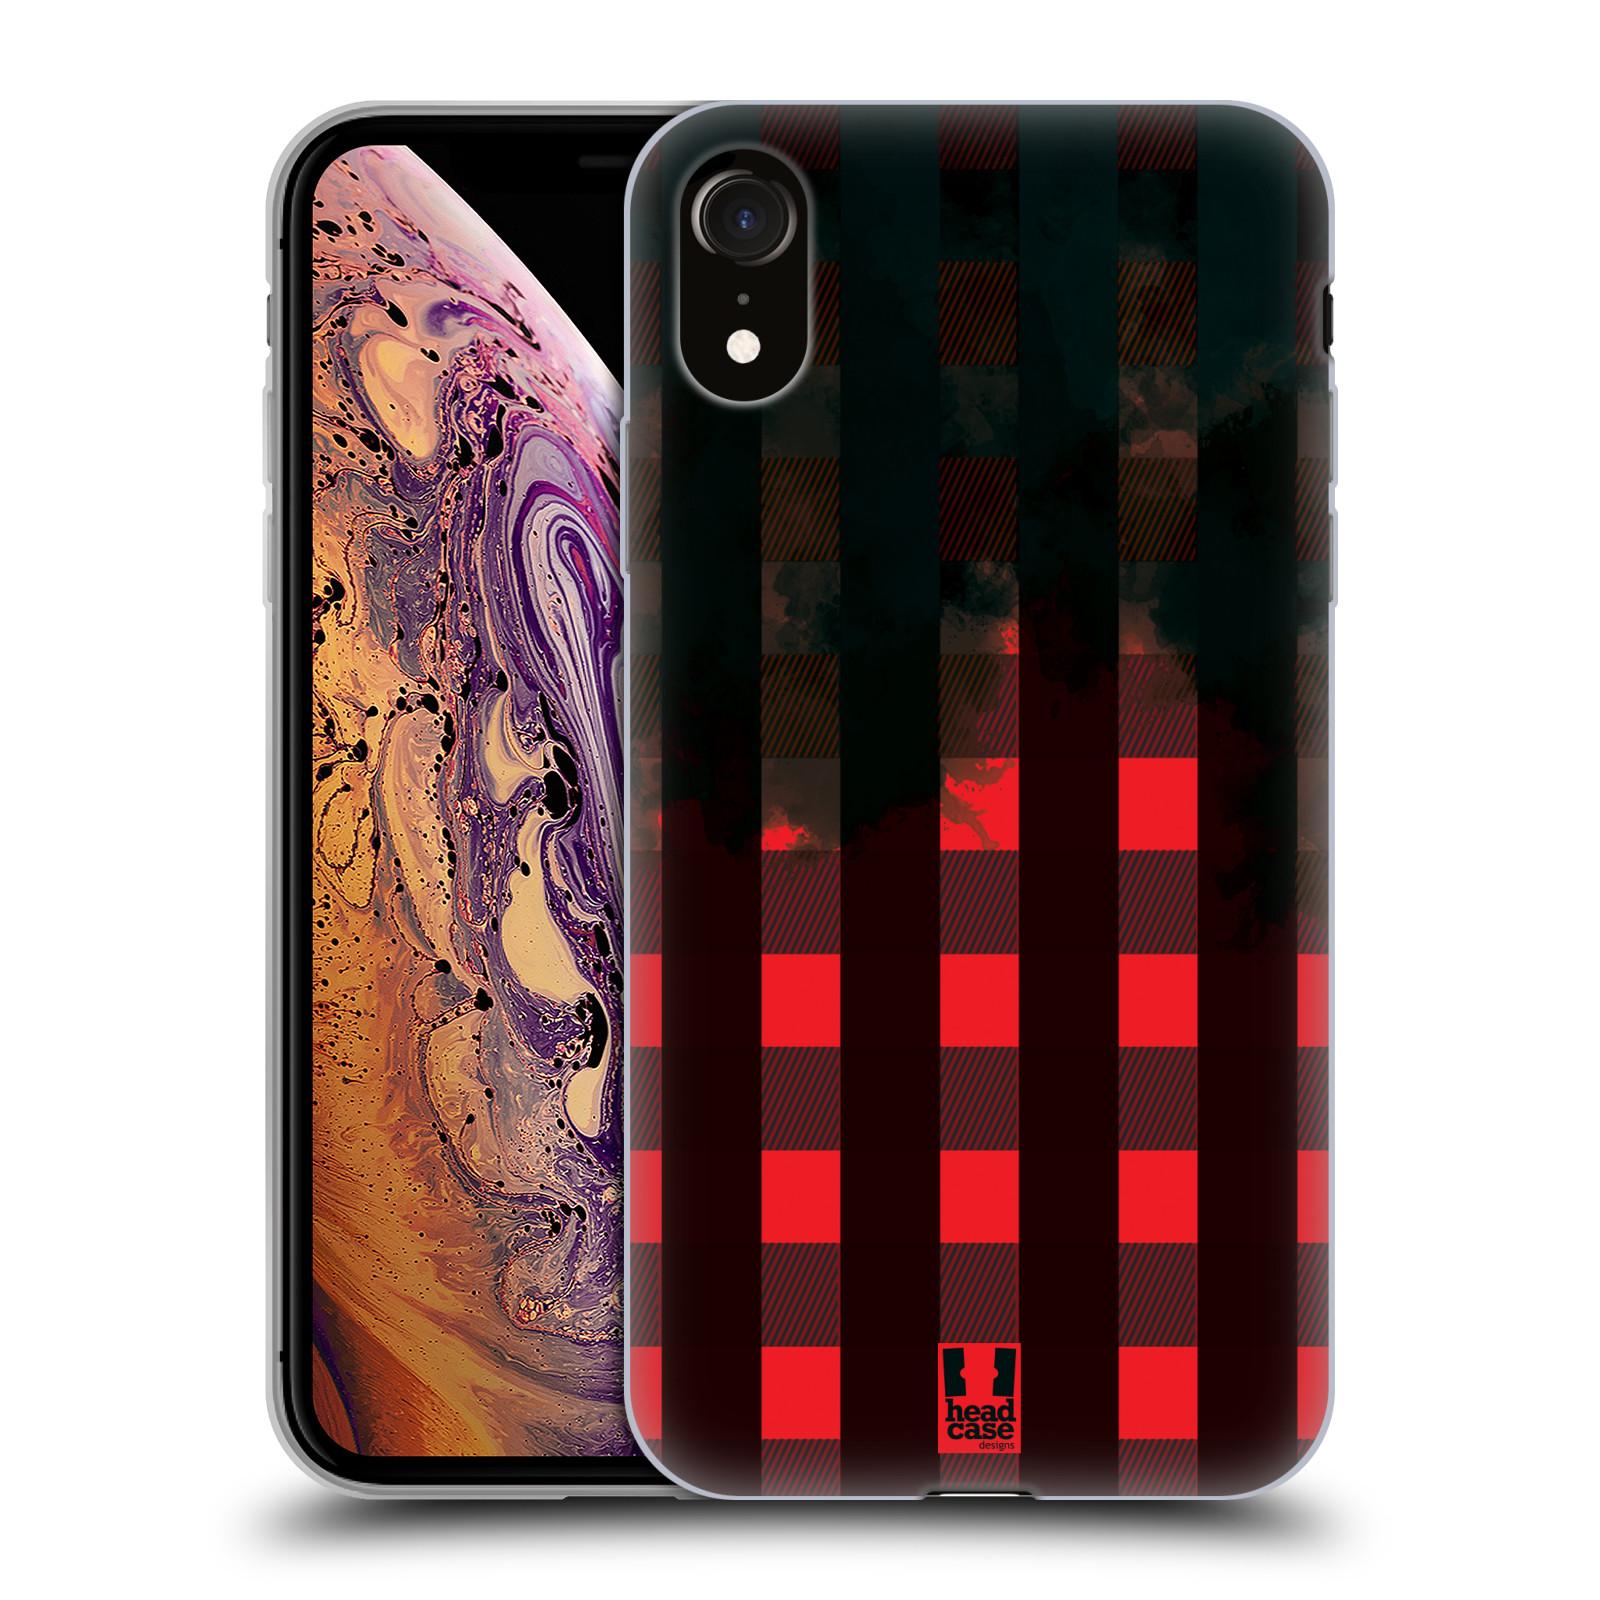 Silikonové pouzdro na mobil Apple iPhone XR - Head Case - FLANEL RED BLACK